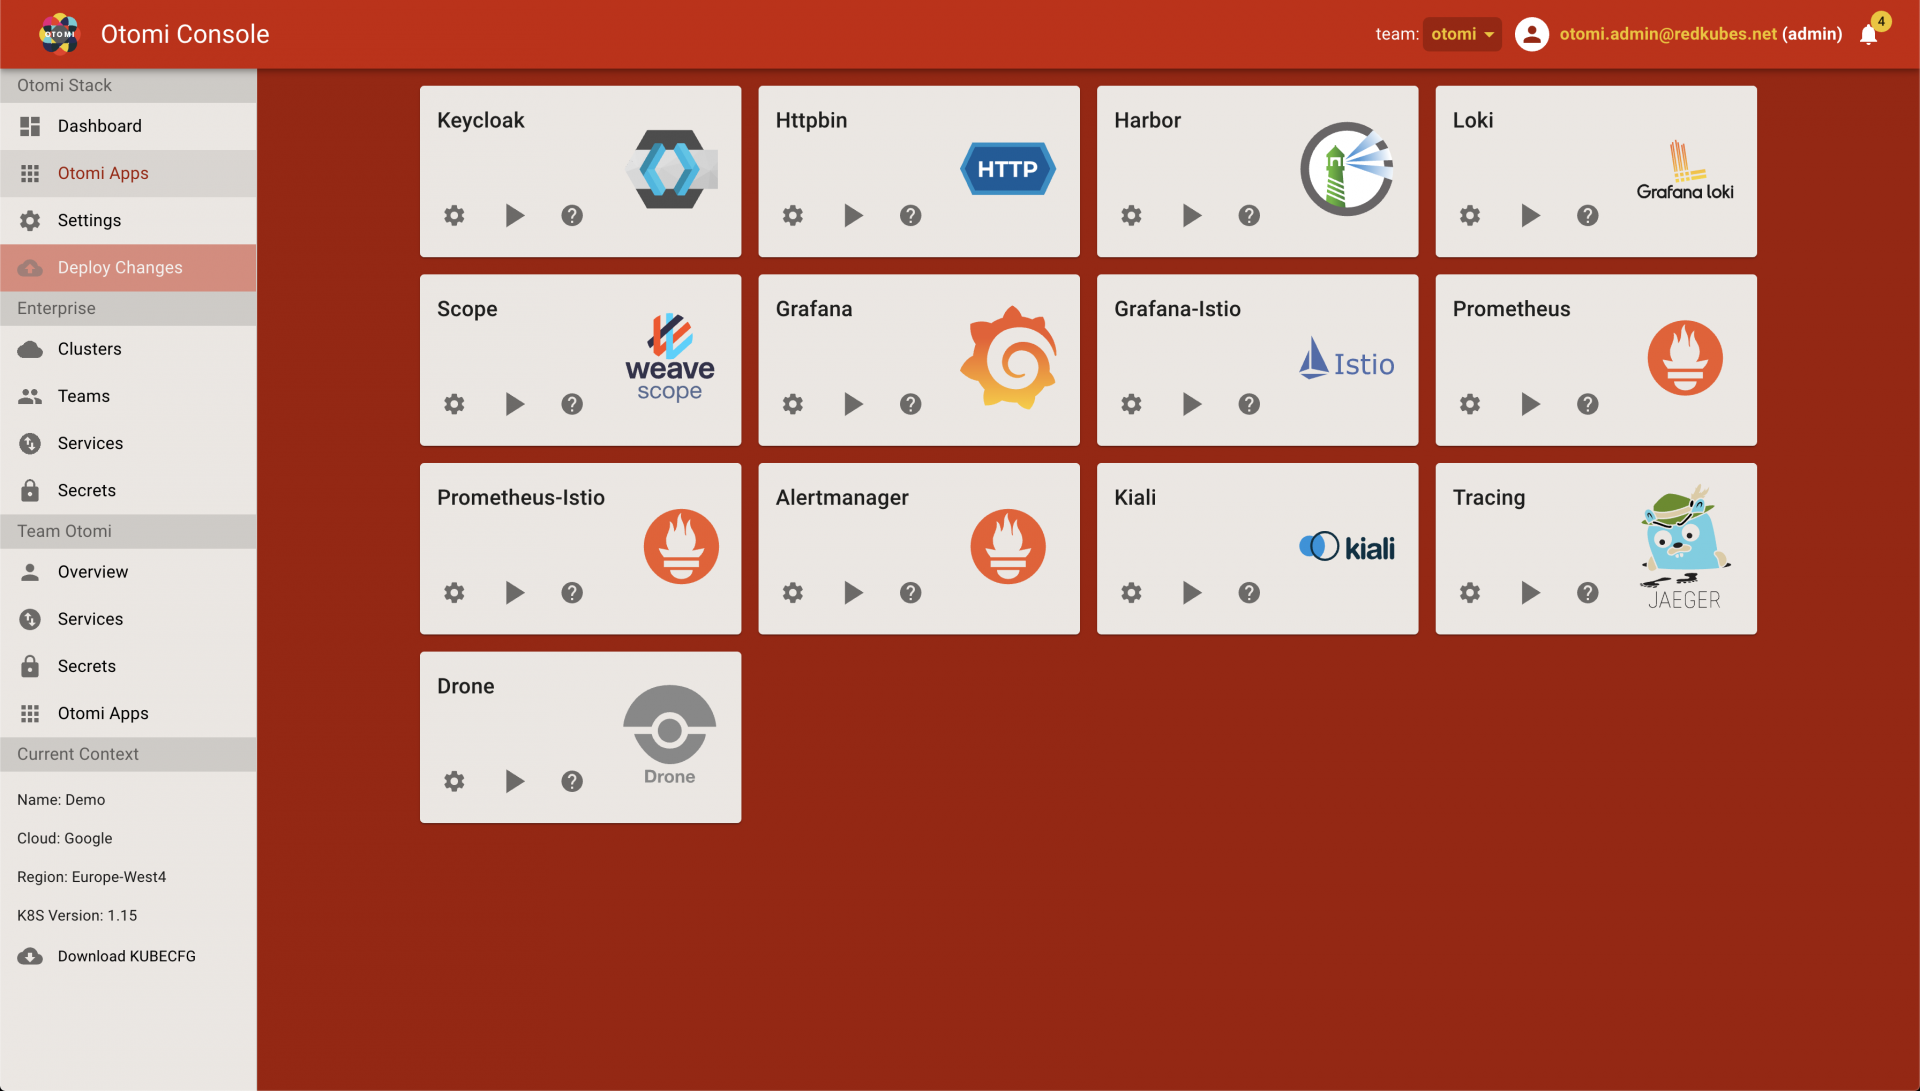 Otomi Container Platform screenshot: Otomi Container Platform deploy changes